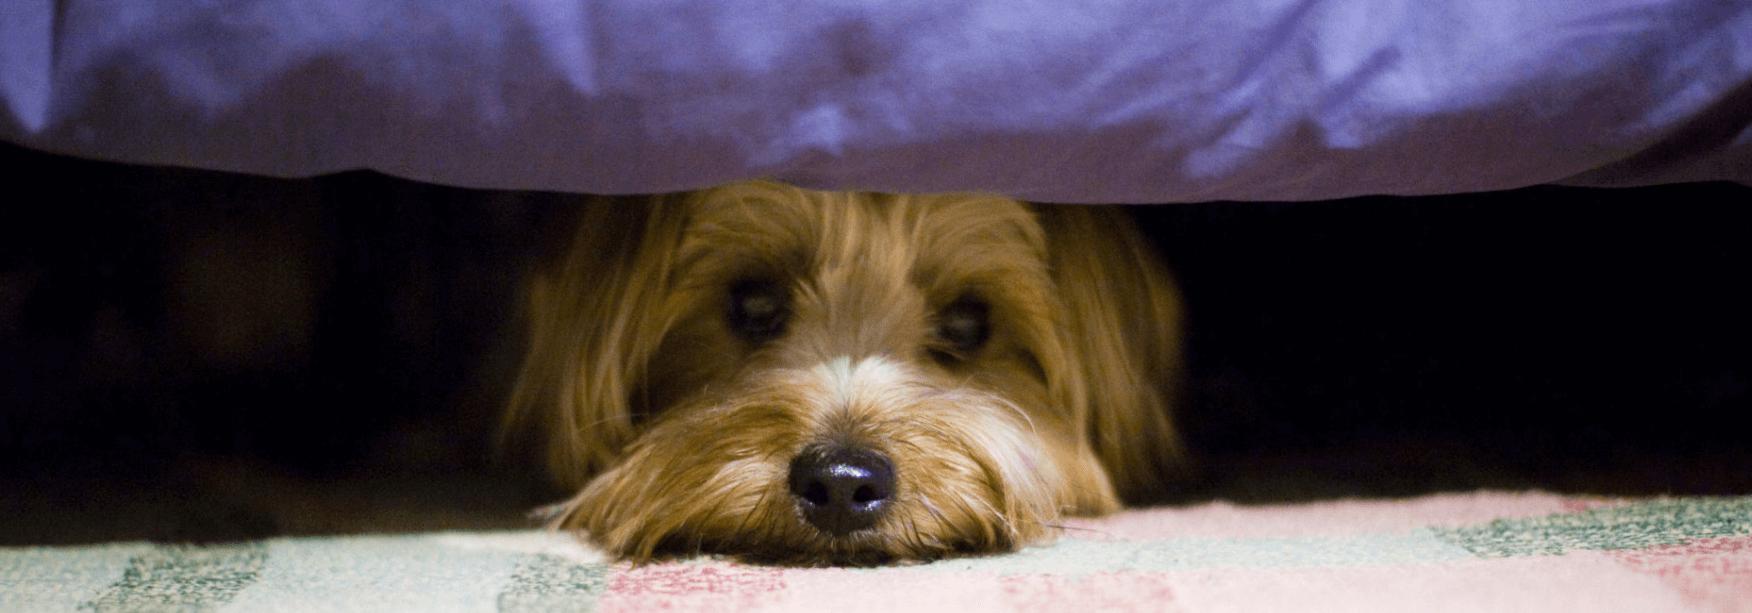 Dog hiding under bed.